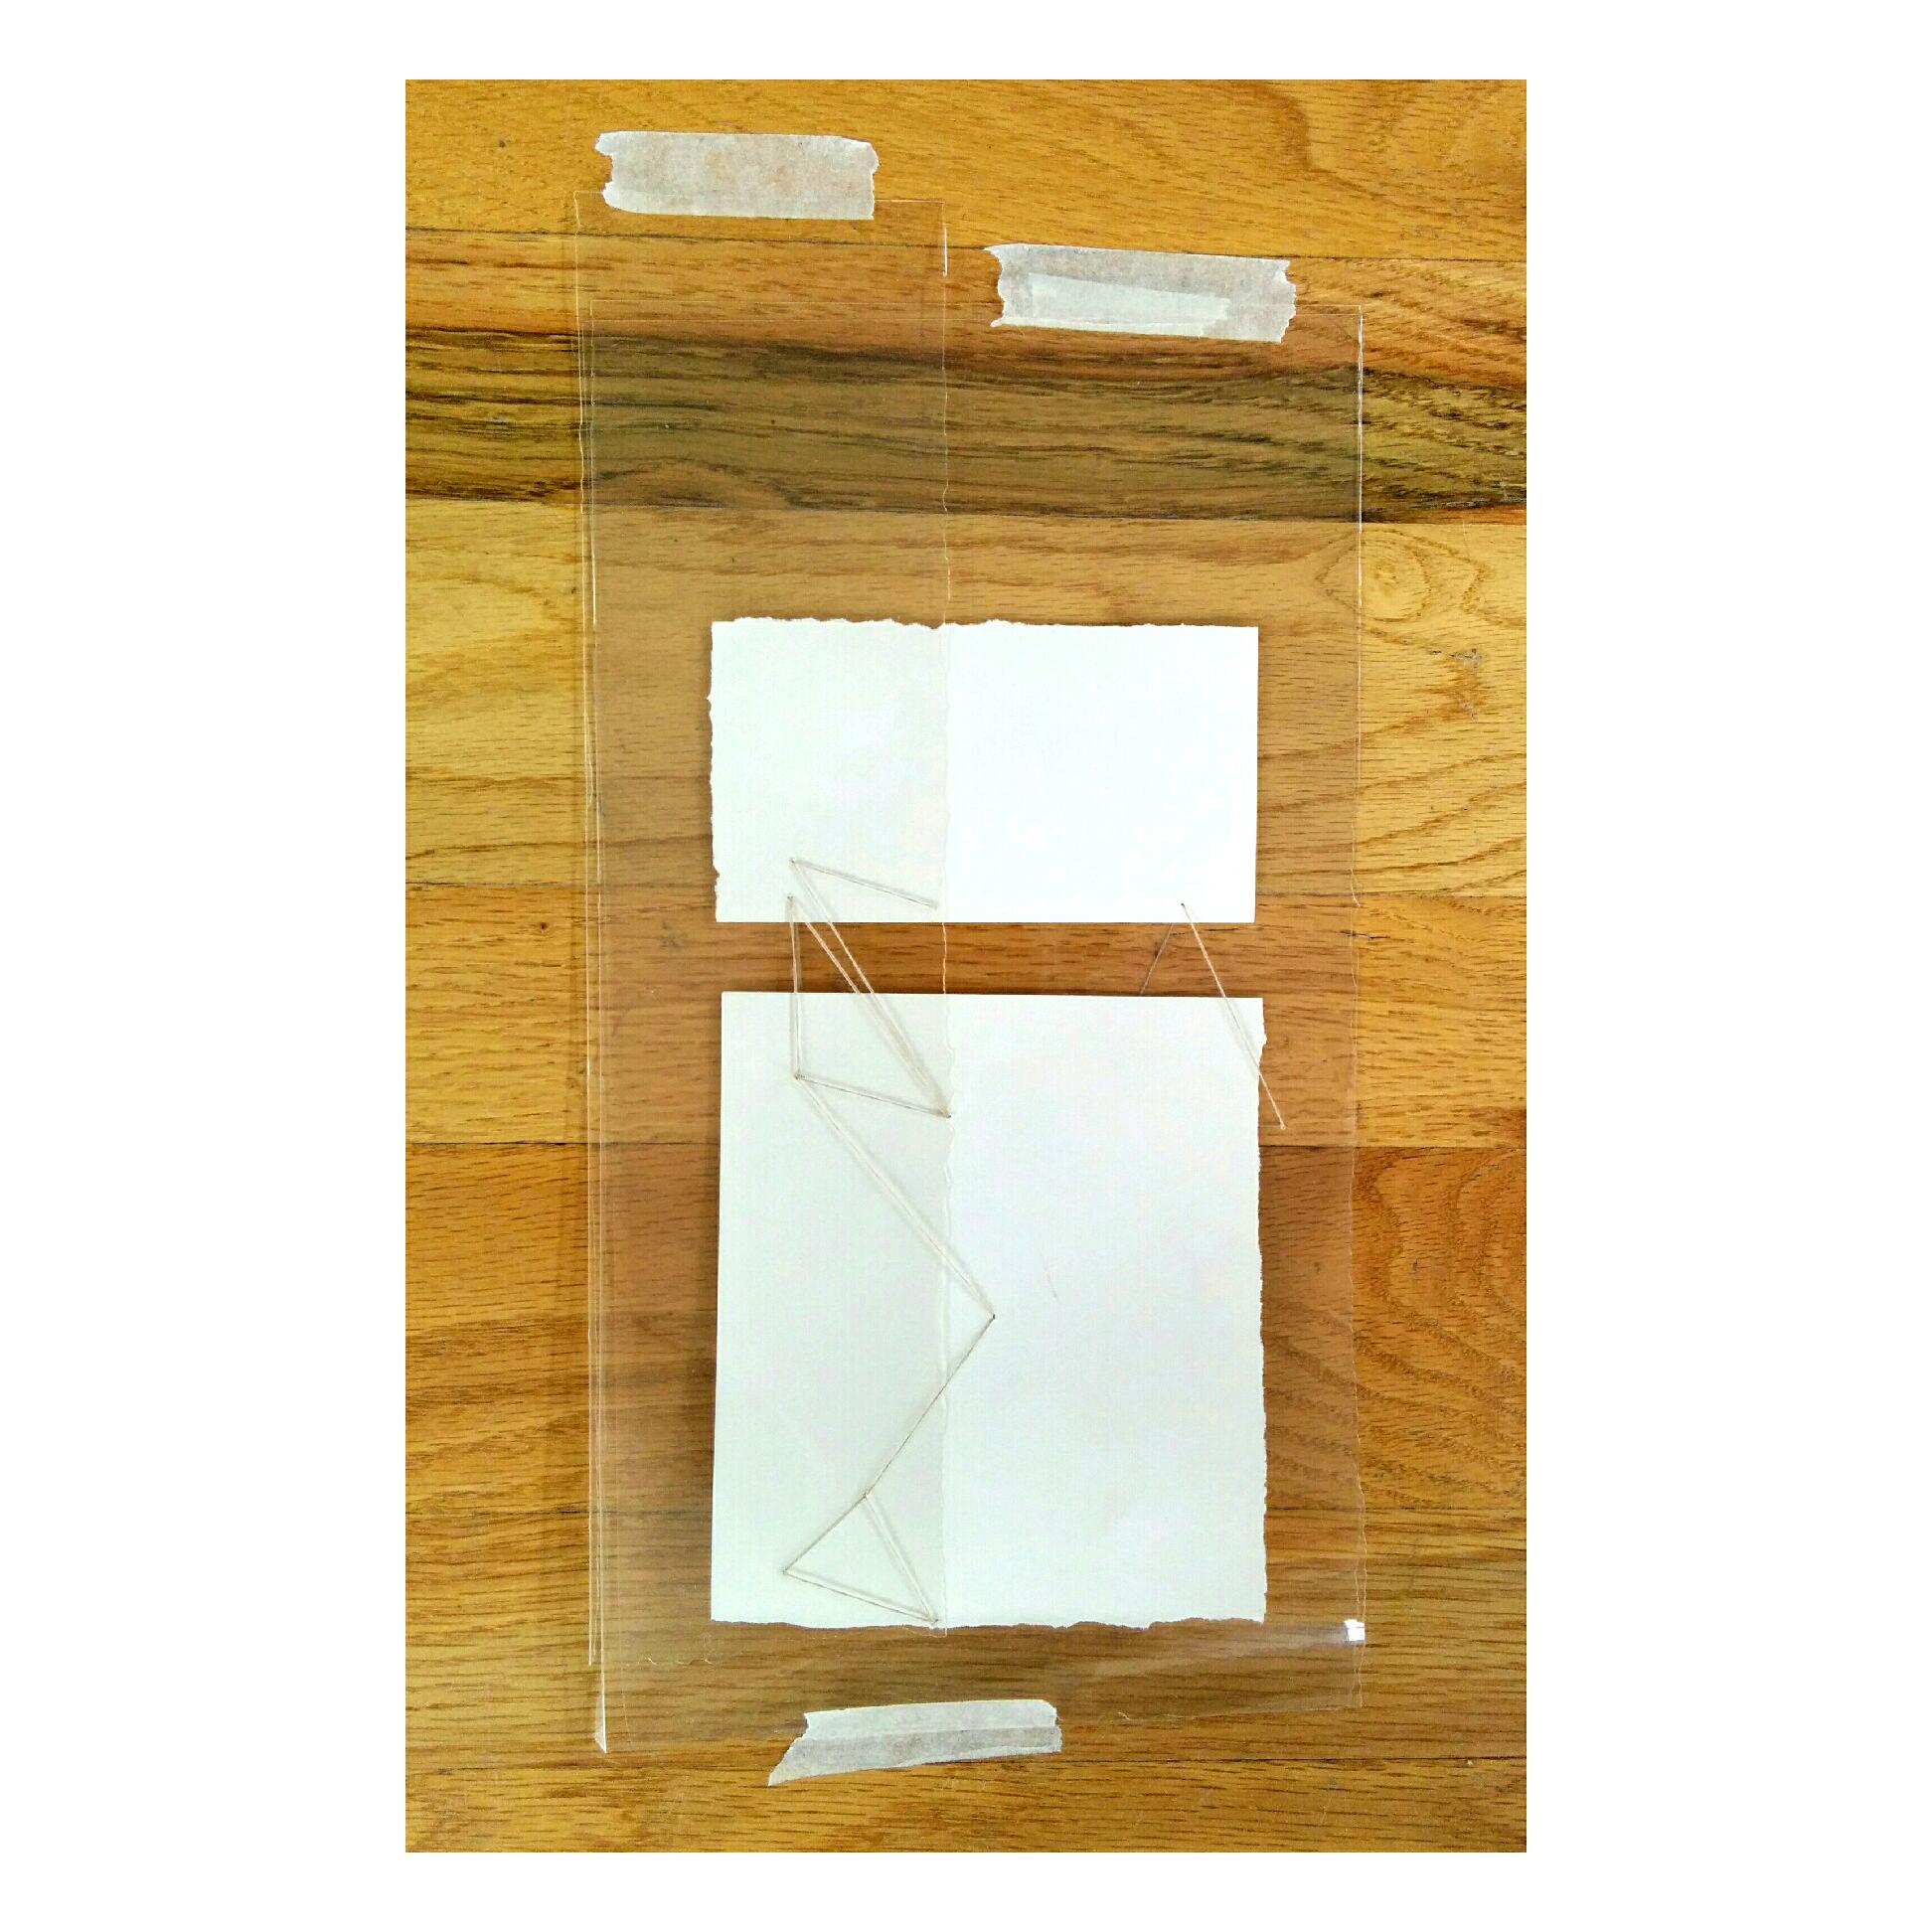 "Building Blocks  14"" x 5.5 "", acetate, paper, tape, and thread"